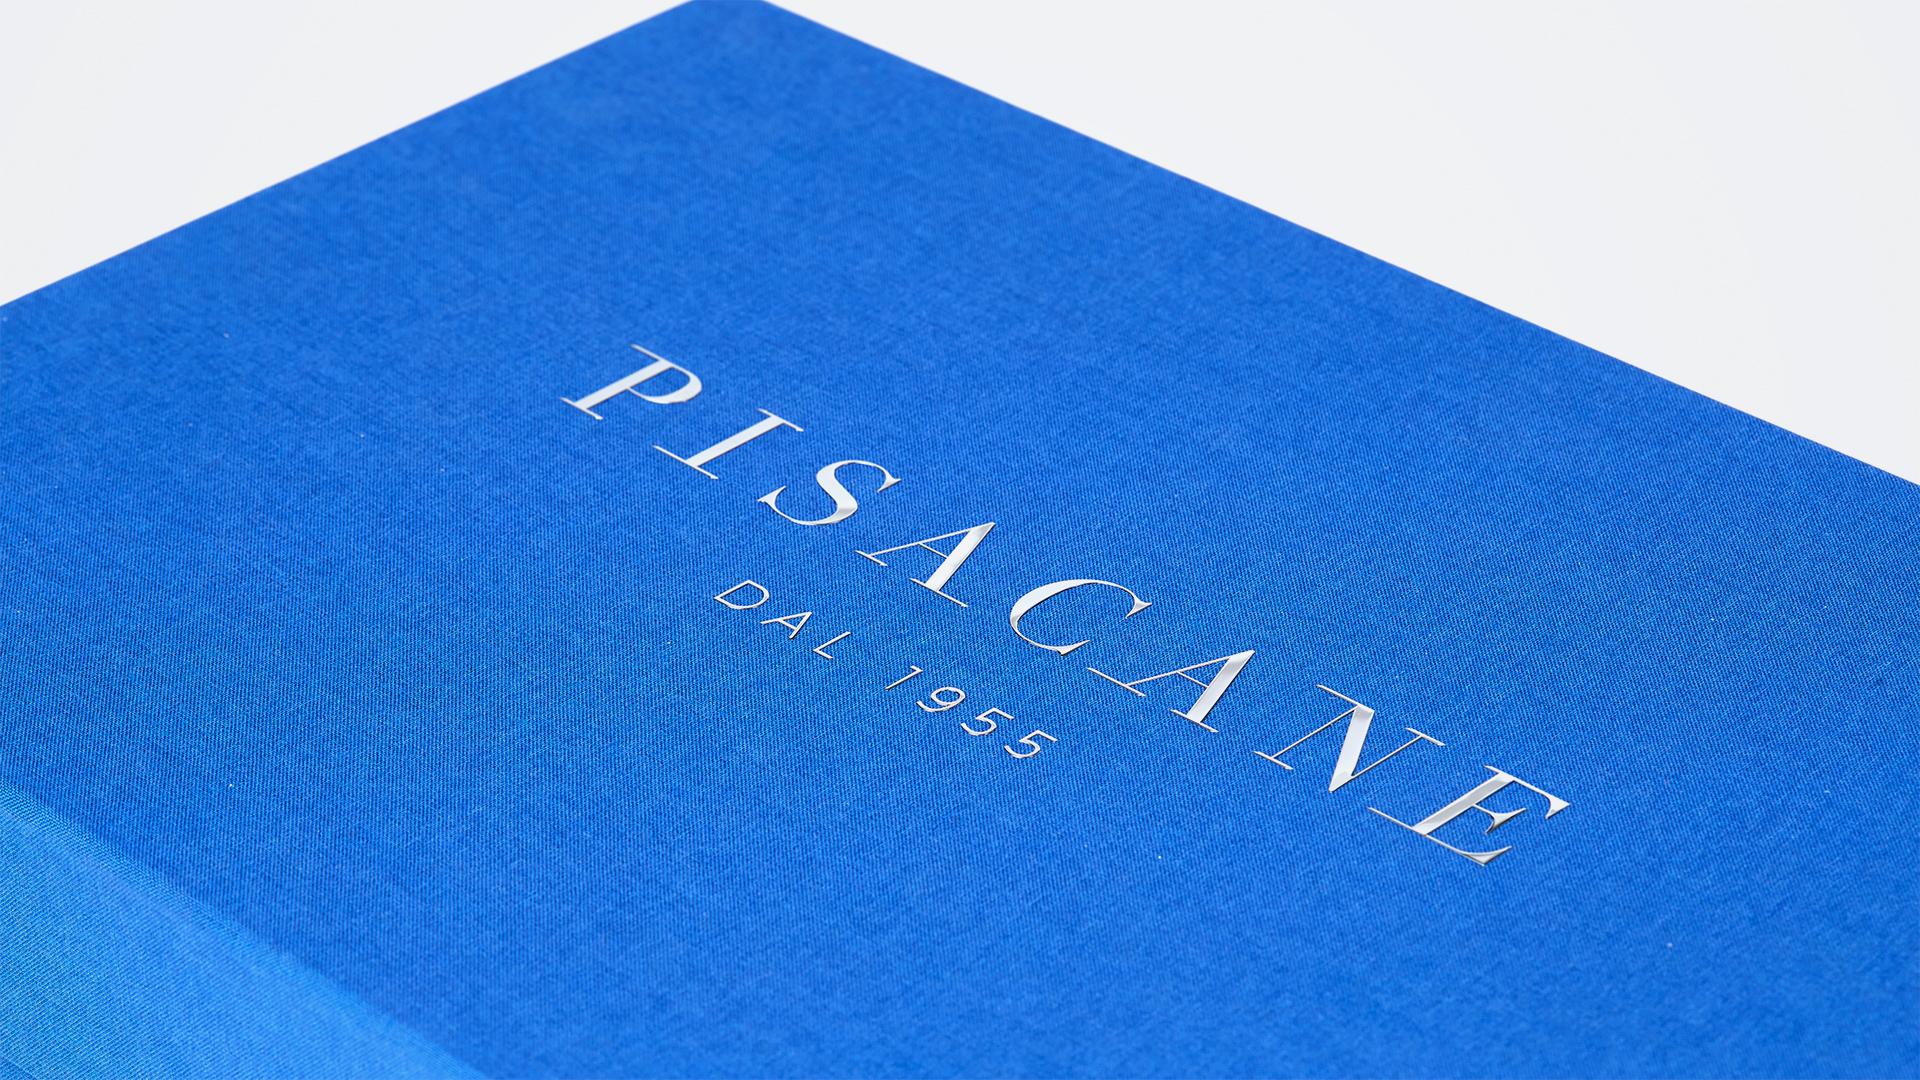 PISACANE_still_14-06-18_Pisacane((-tela-01-5